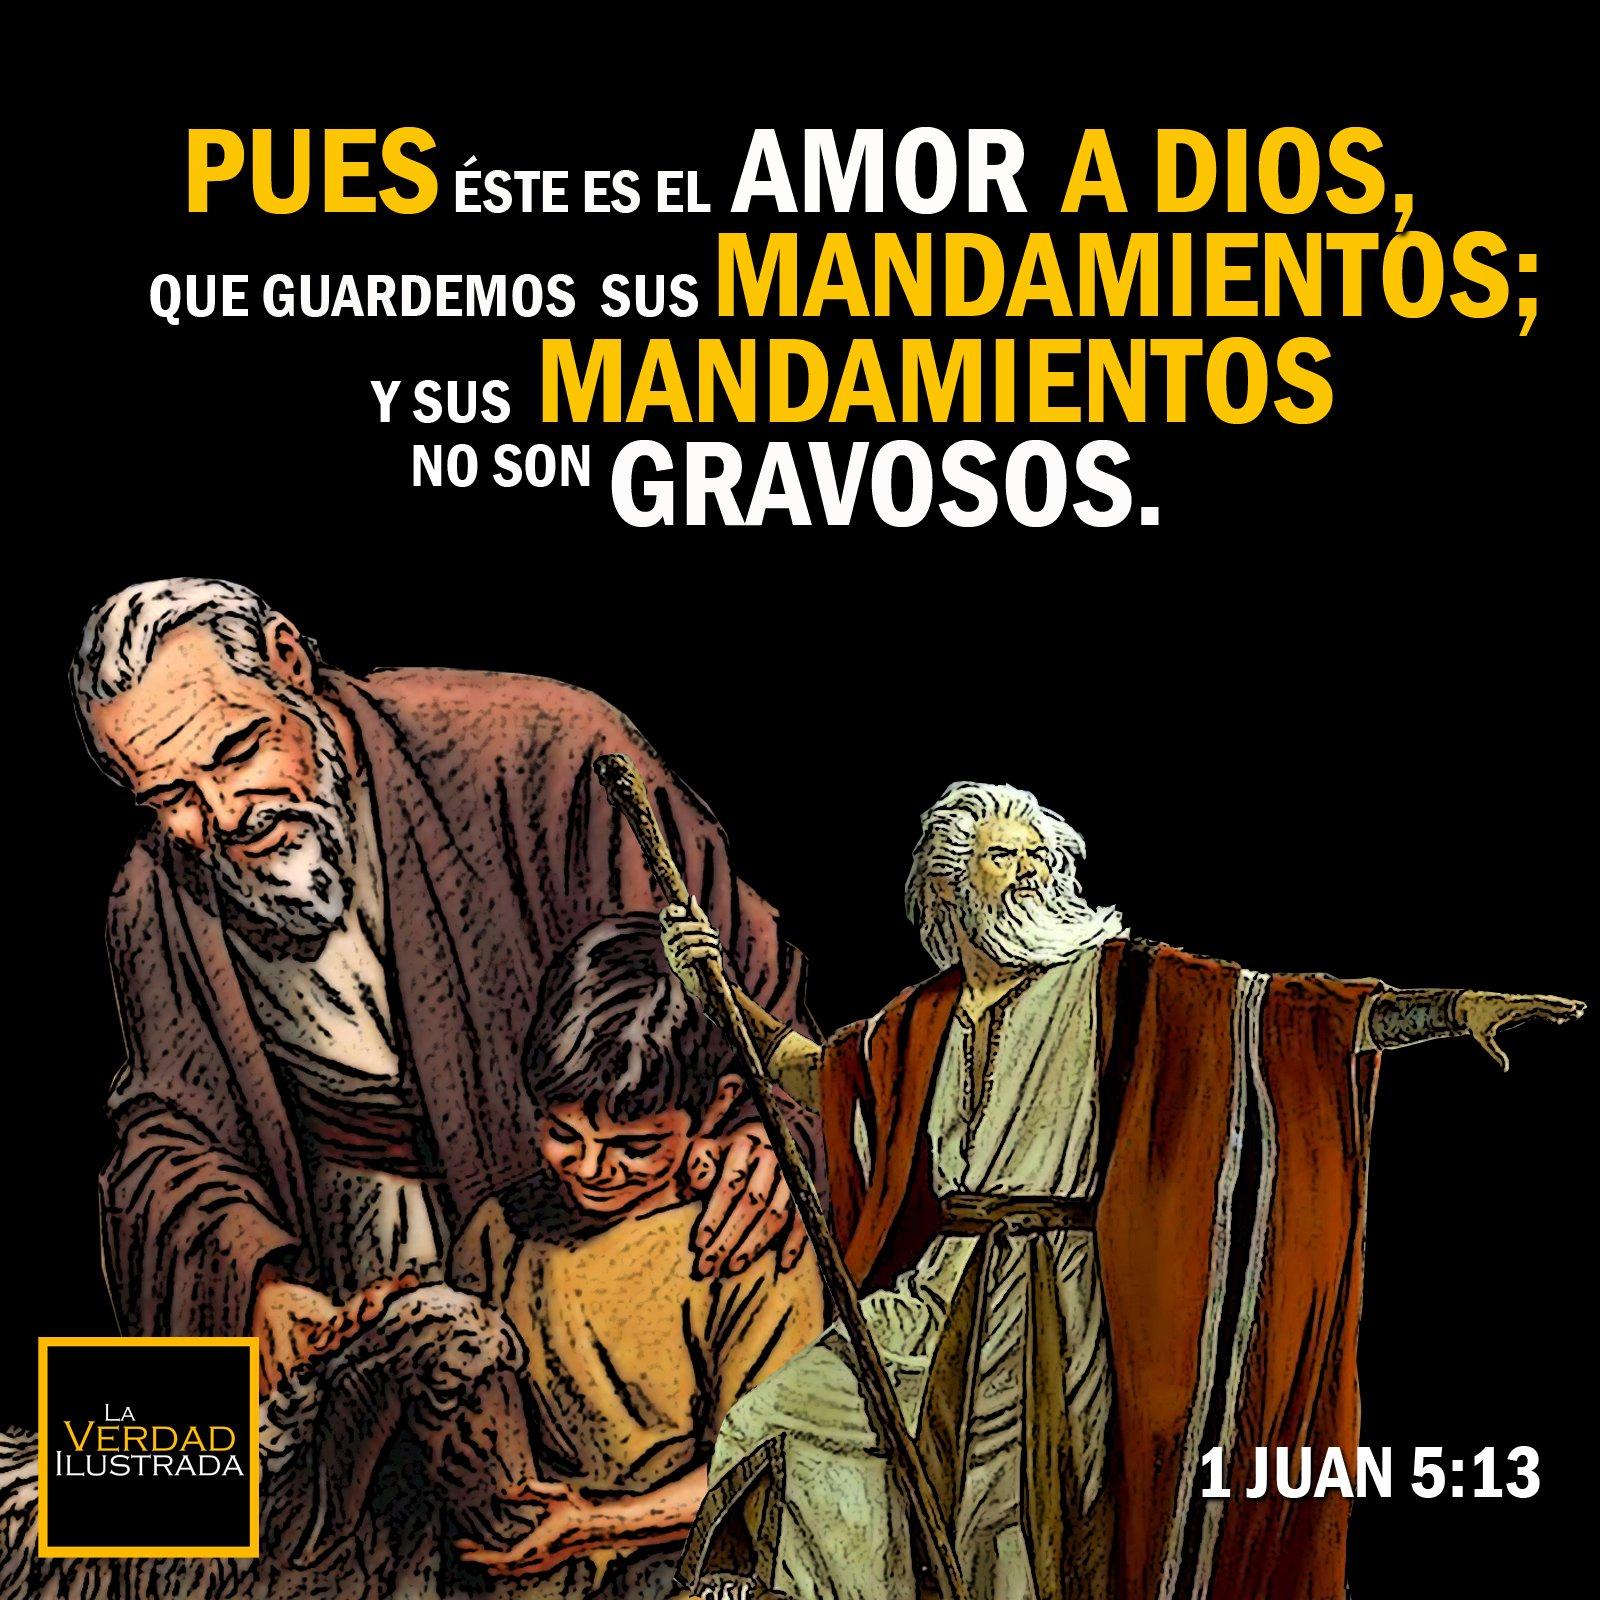 1 Juan 5.13